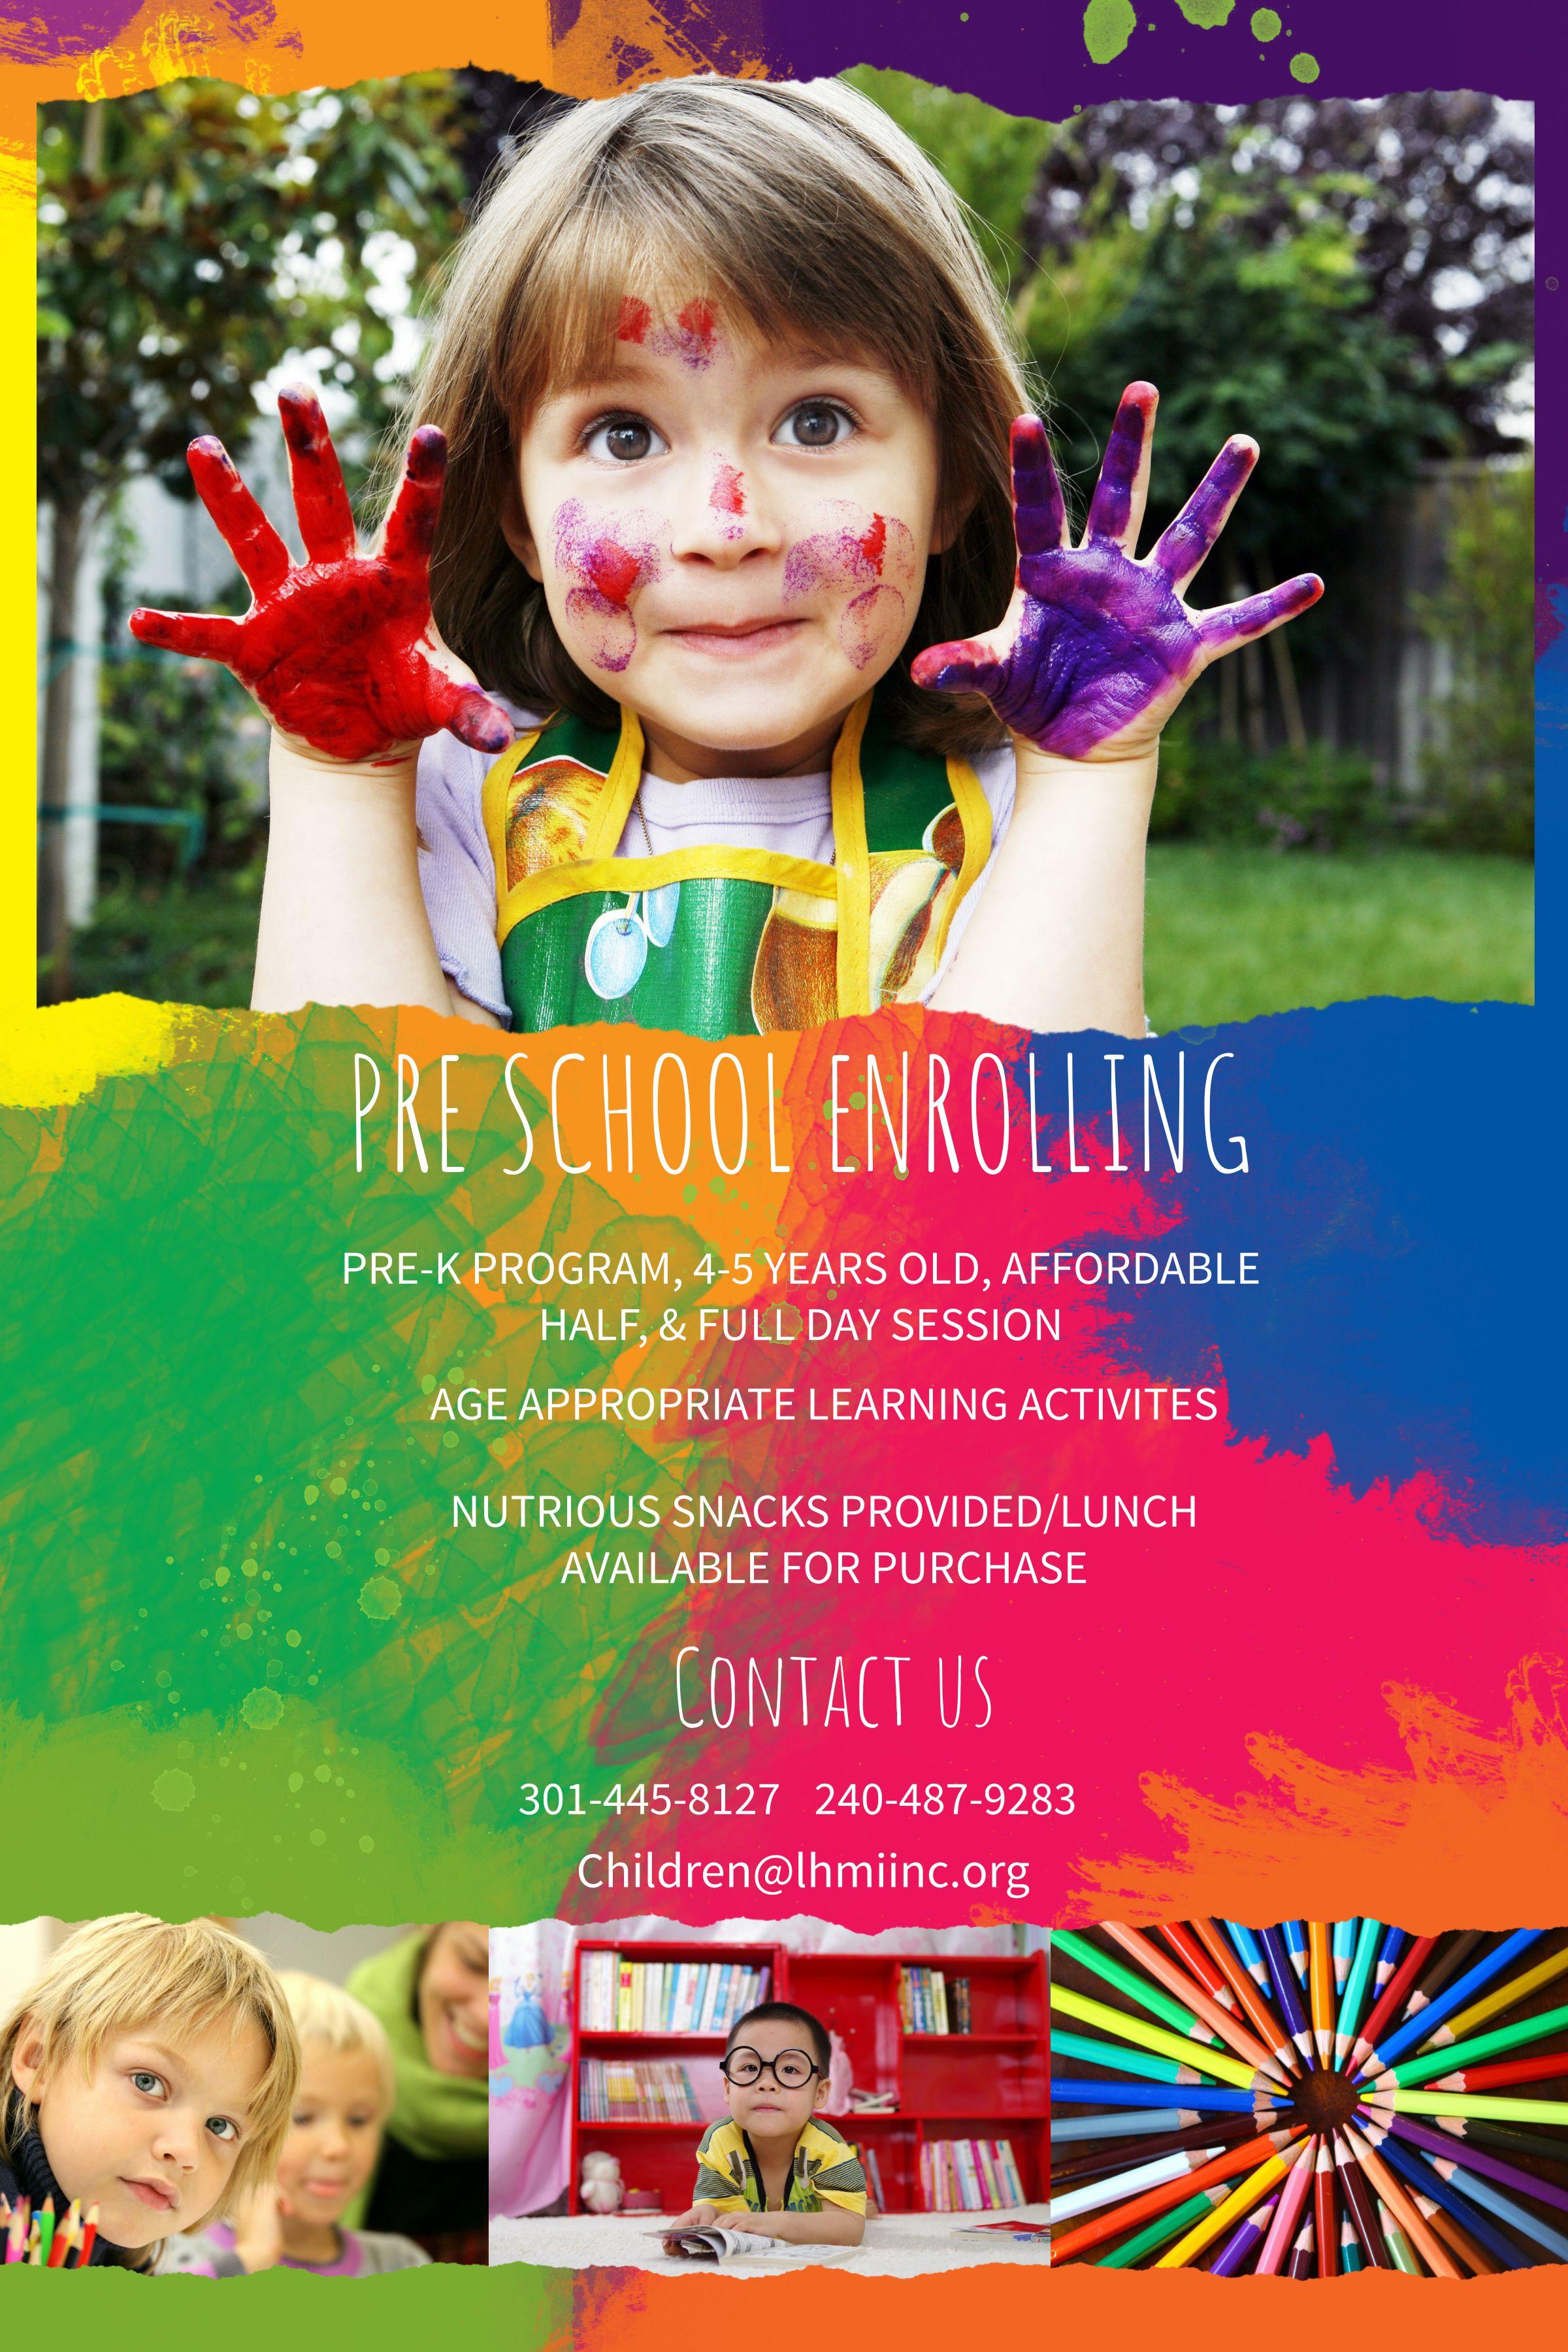 Preschool Enrollment Colorful Poster Flyer Template Preschool